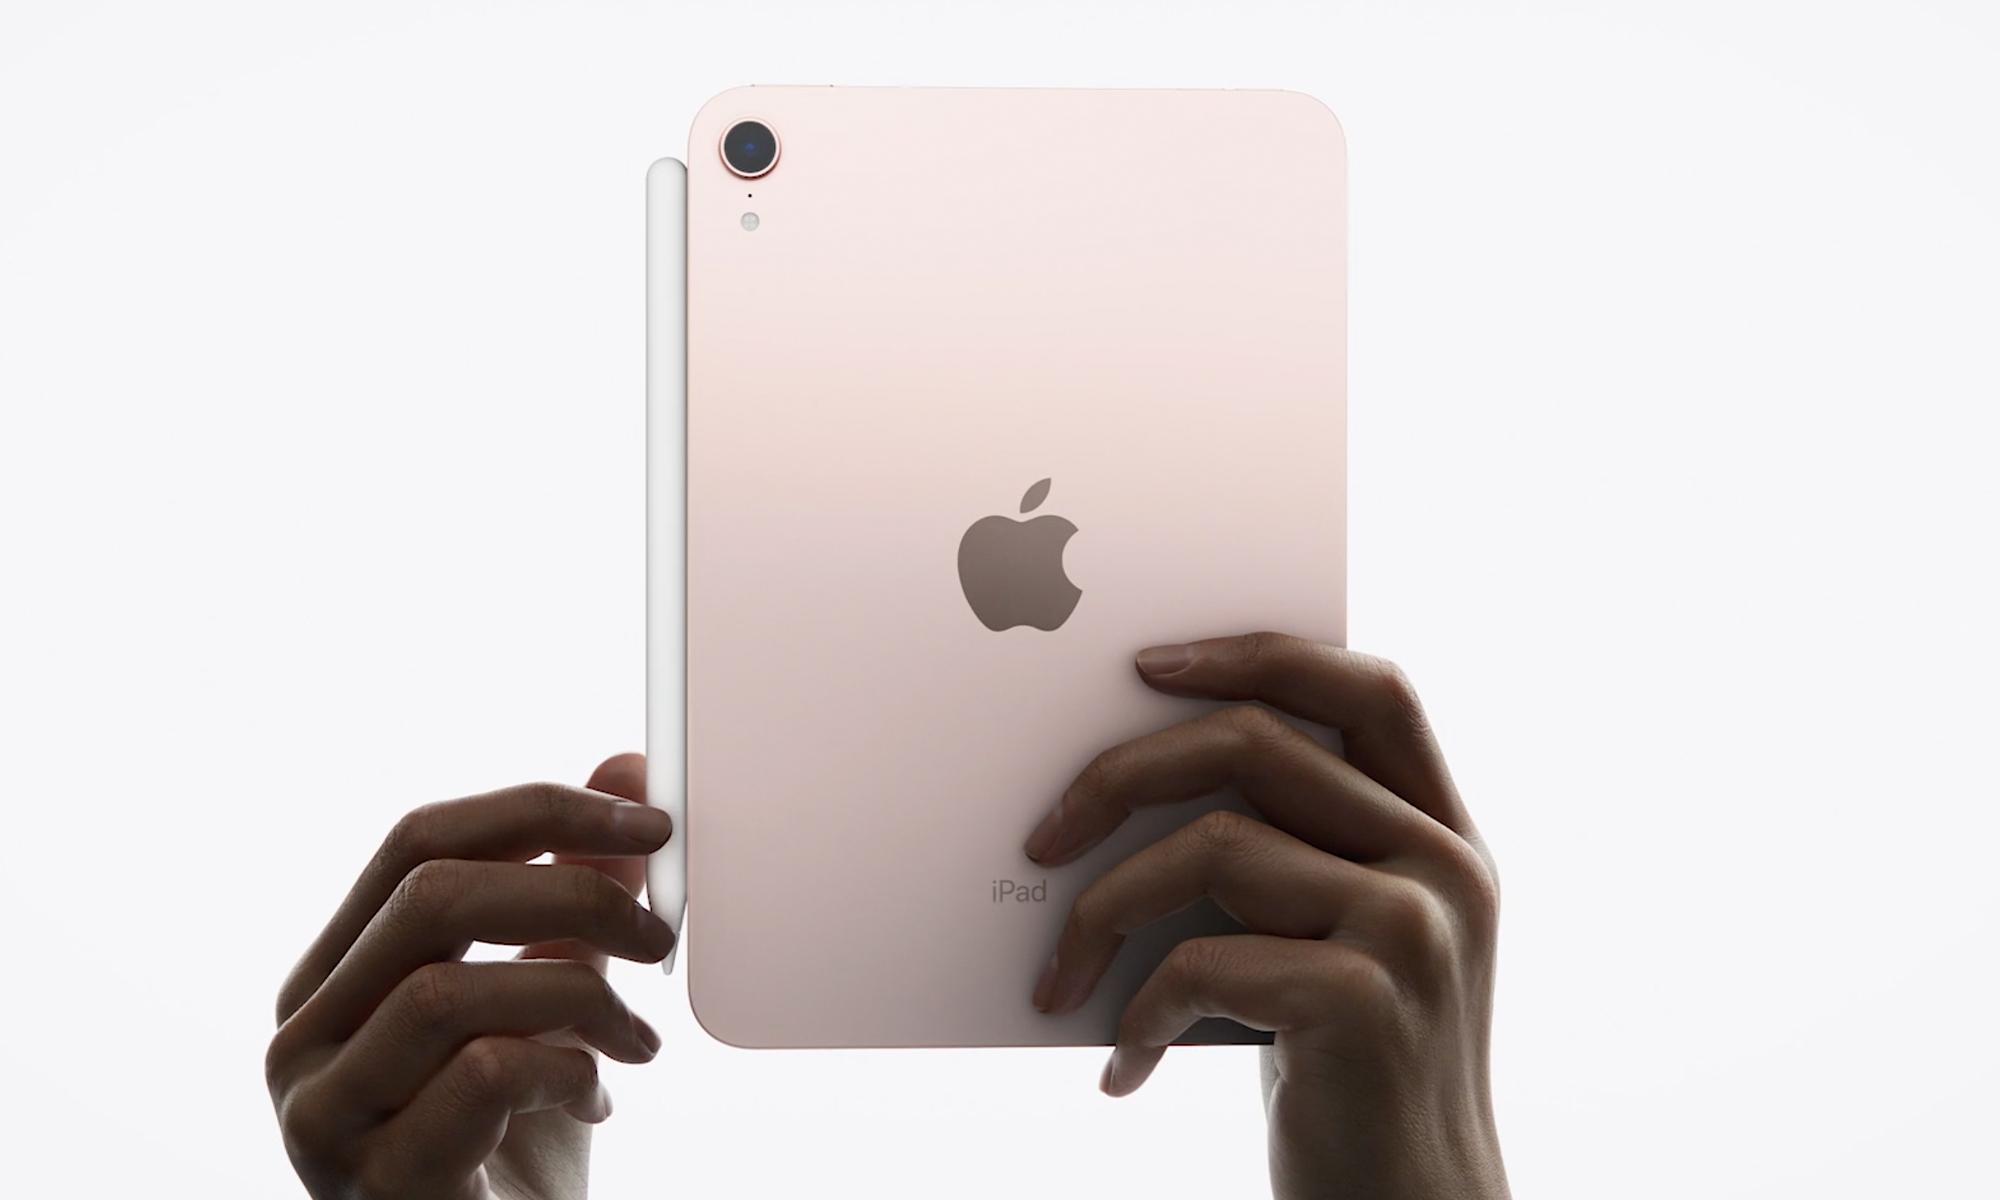 Apple's sixth-gen iPad mini gets USB-C and an all-screen design